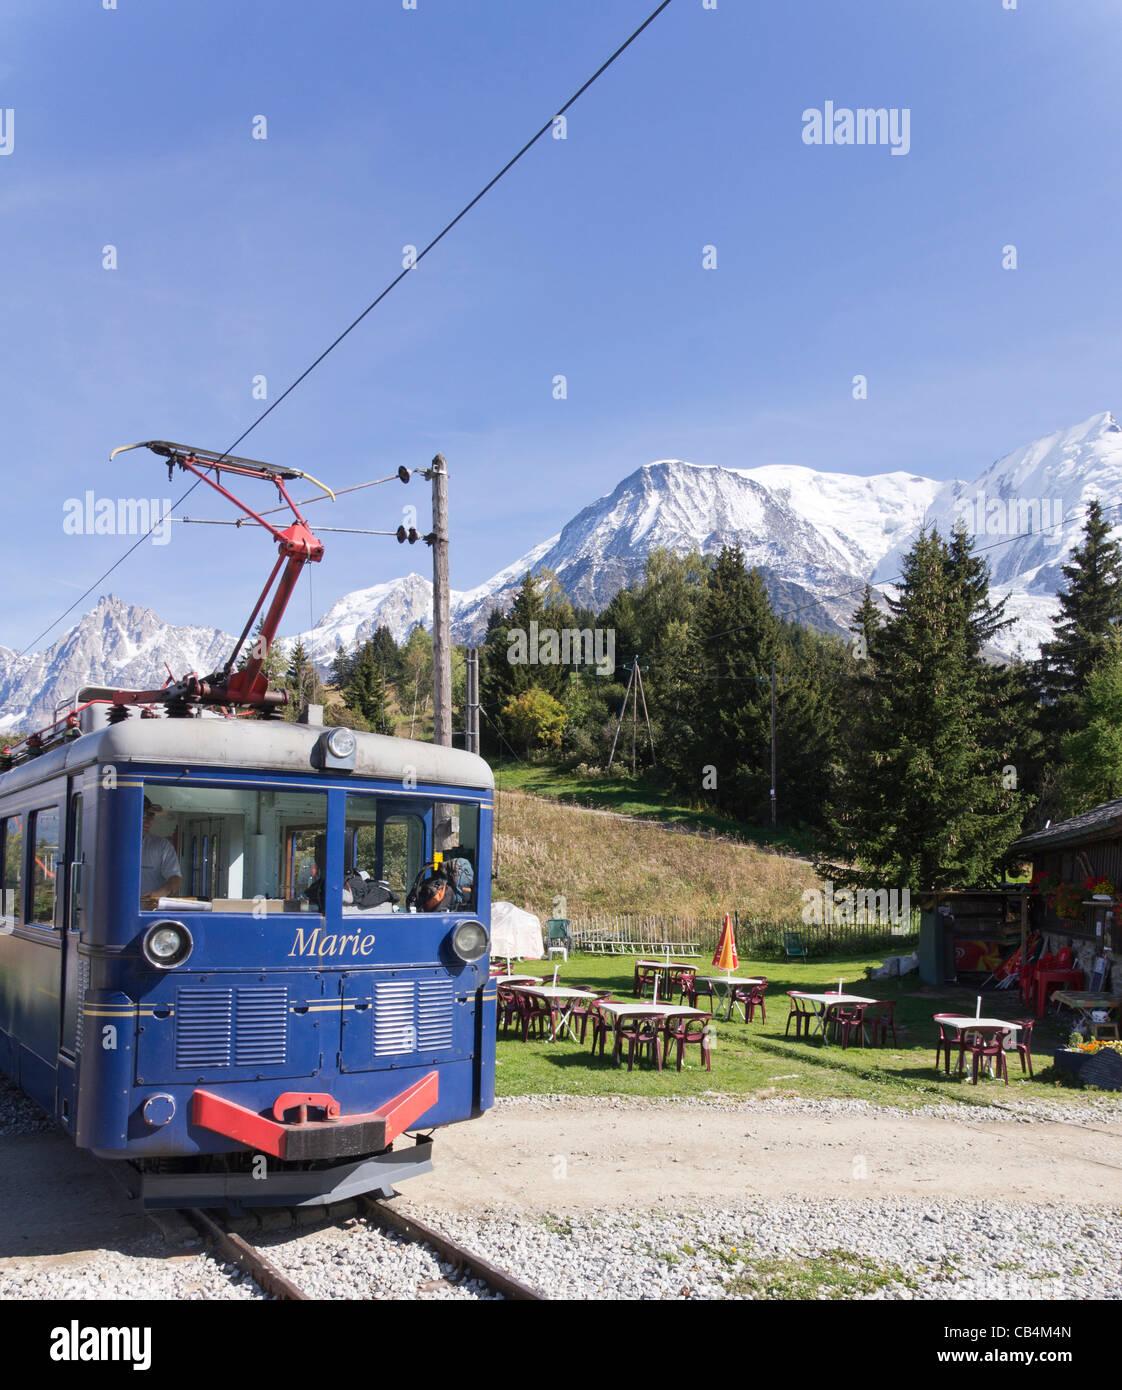 Tramway Du Mont-blanc : tramway, mont-blanc, Tramway, Blanc, Train,